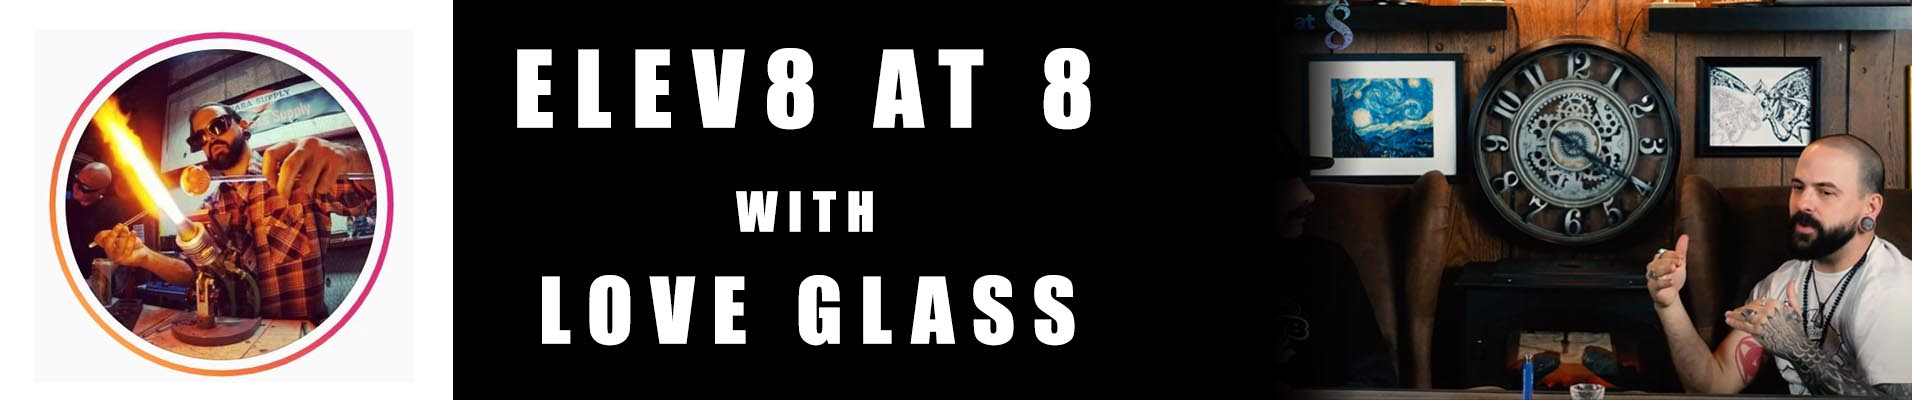 love-glass-elev8-at-8-blog-banner.jpg